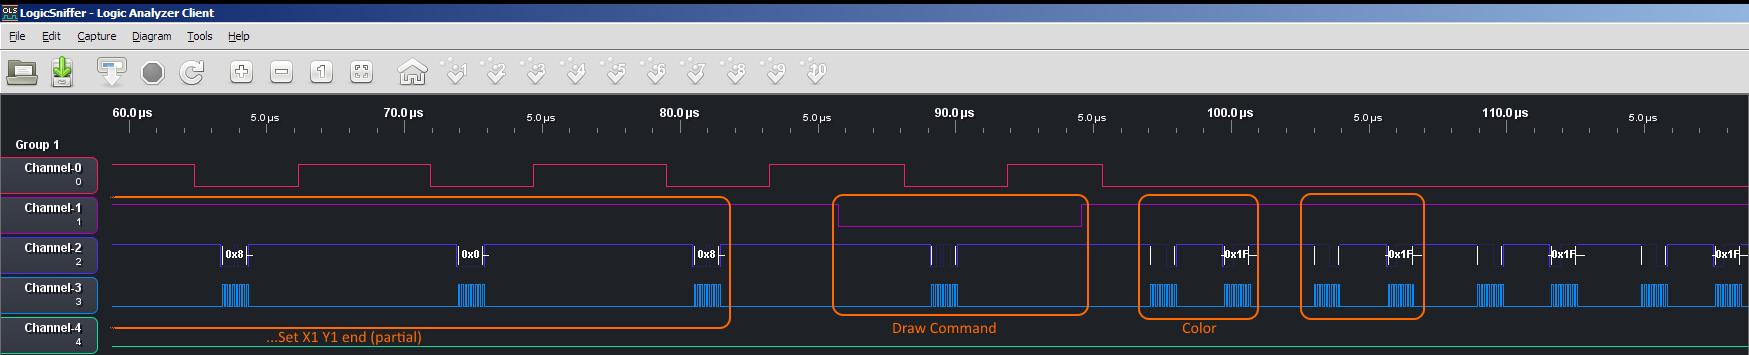 PDQ_GFX optimzed AVR LCD graphics | Hackaday io